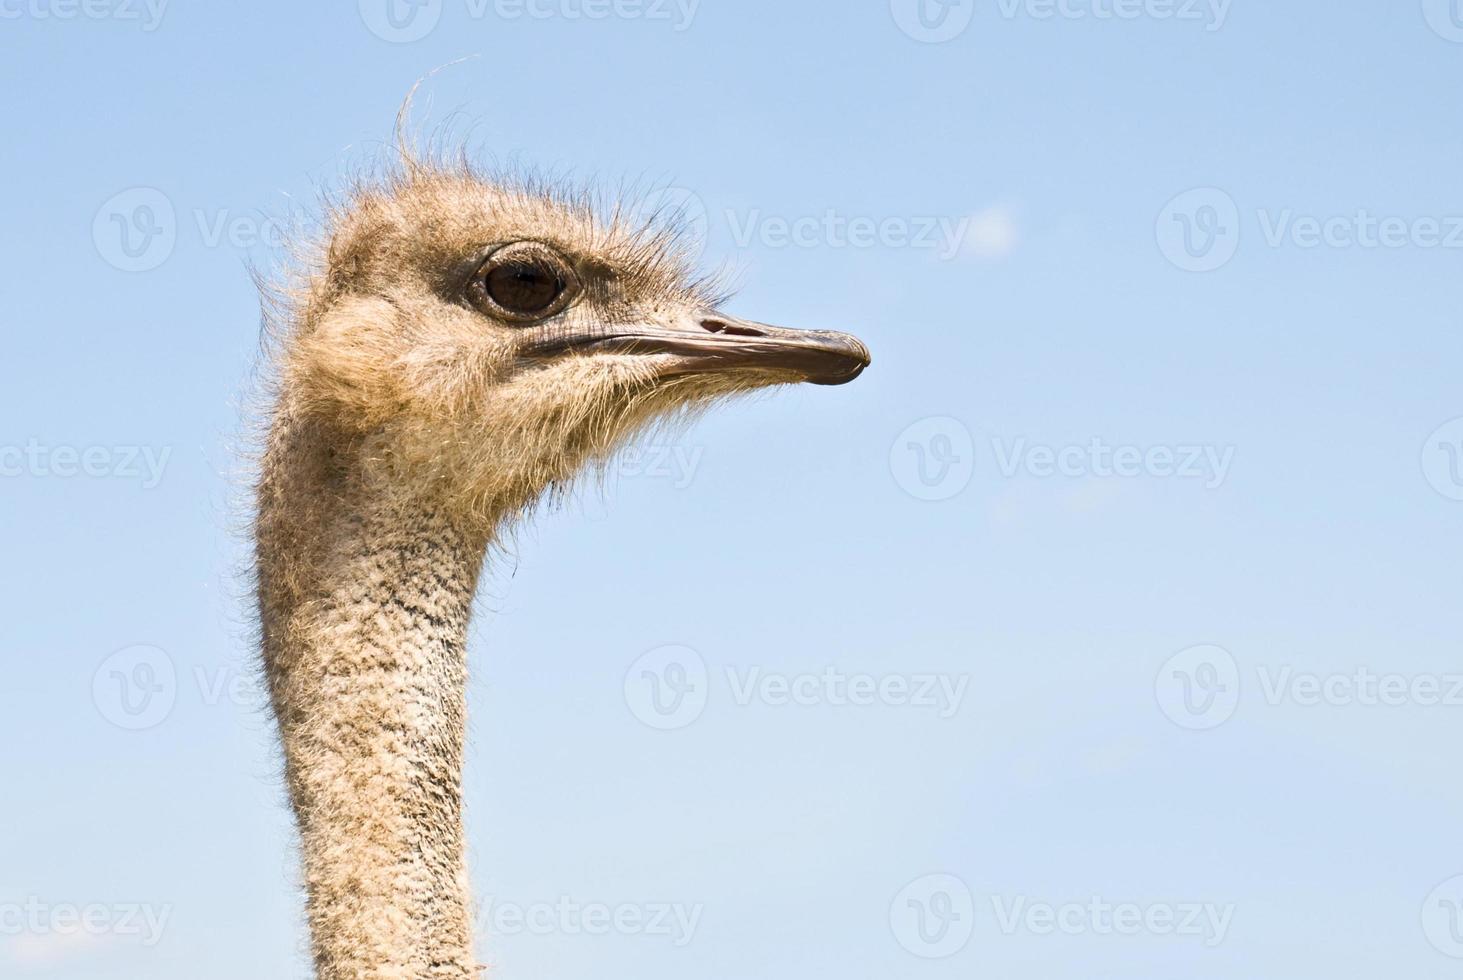 profiel van struisvogel foto